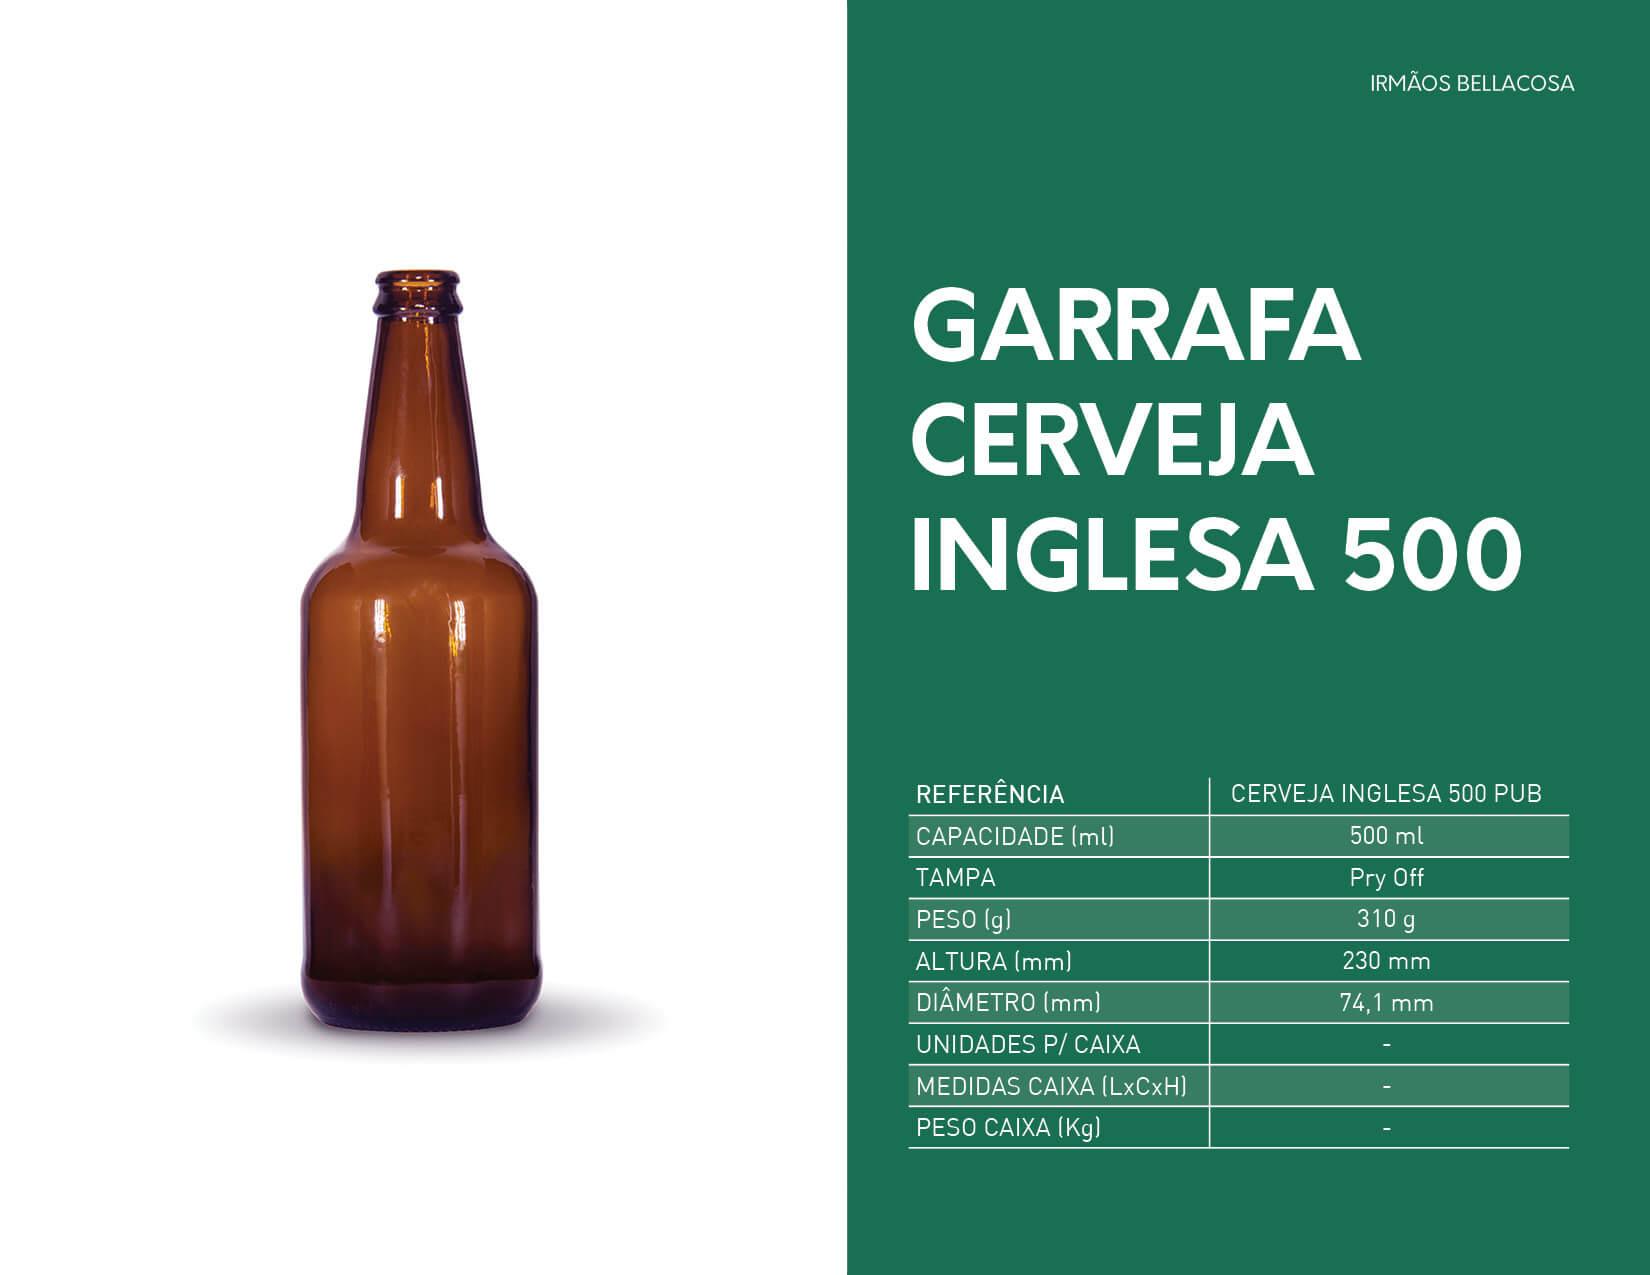 052-Garrafa-Cerveja-Inglesa-500-irmaos-bellacosa-embalagens-de-vidro